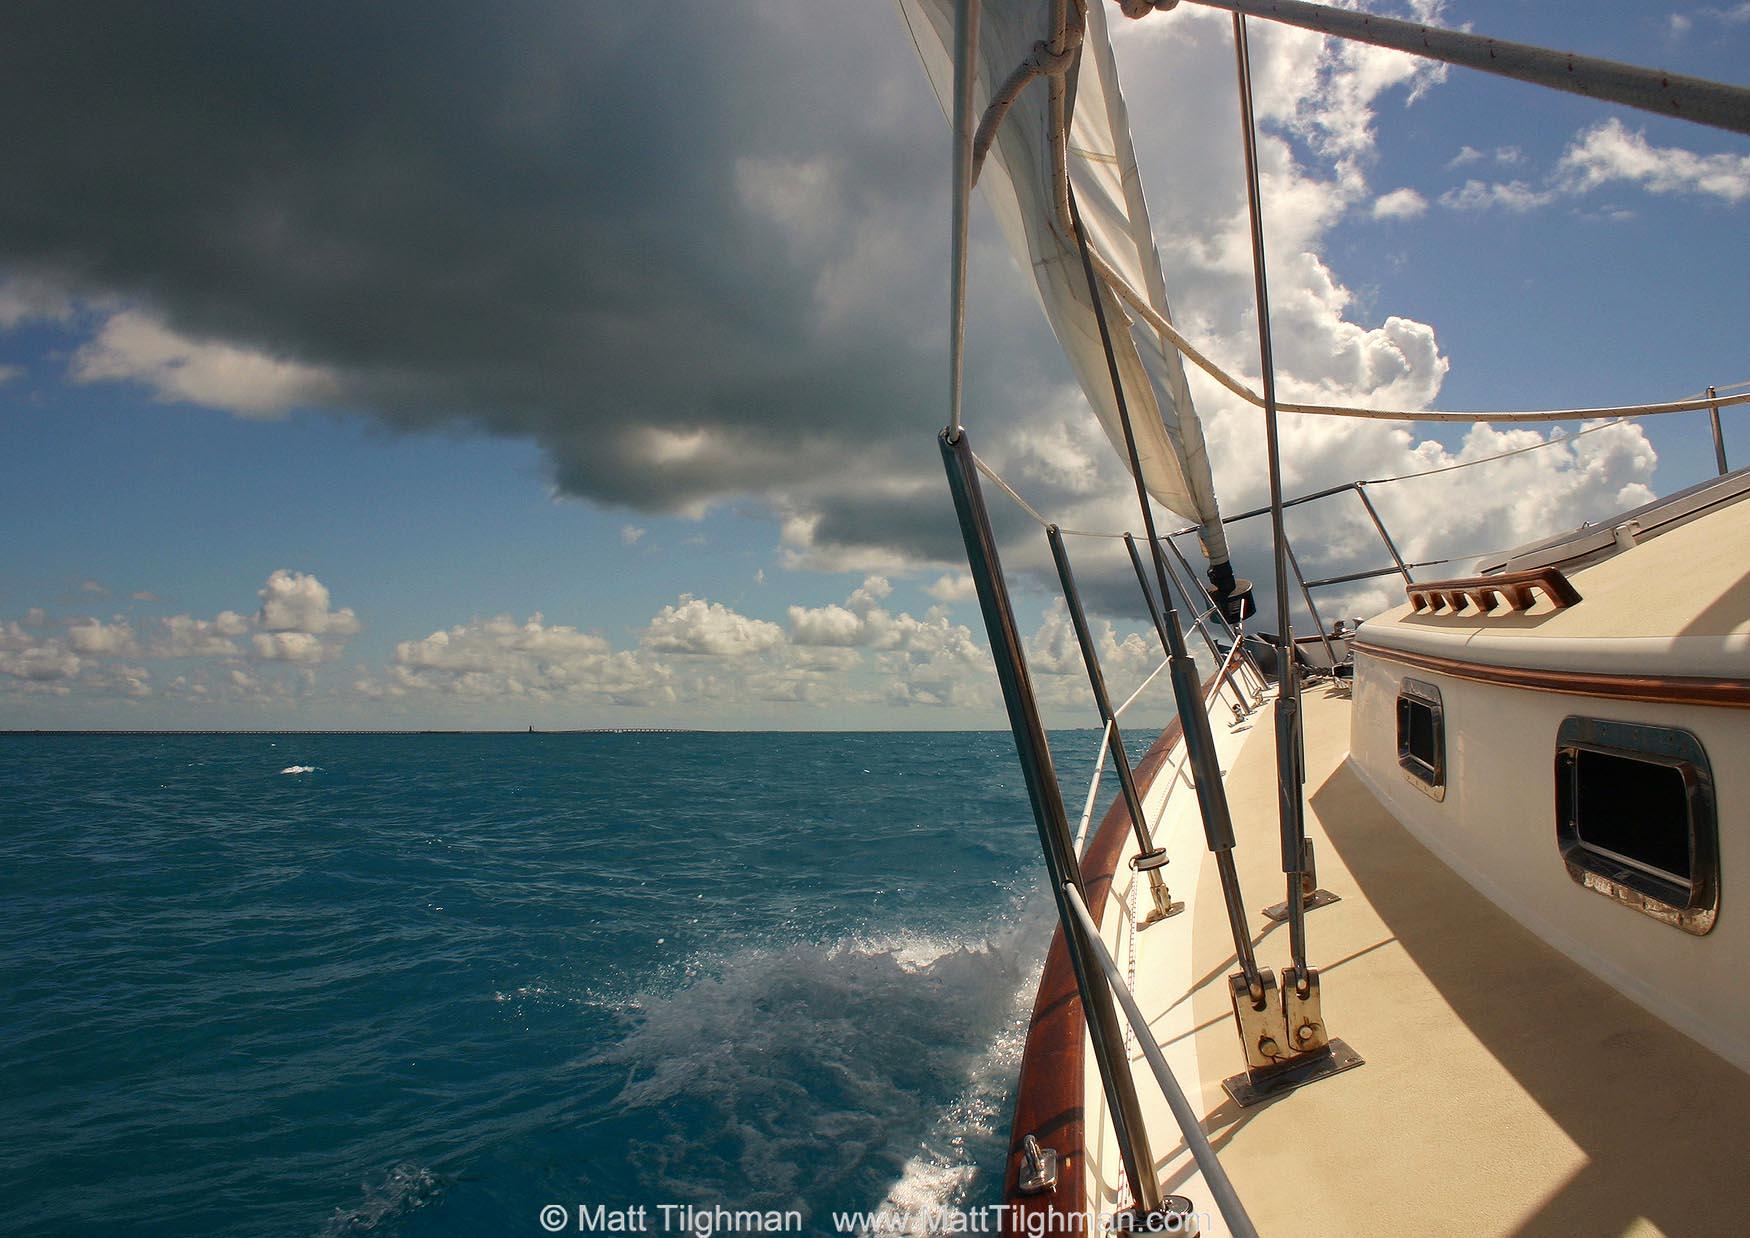 Sailing in the Florida Keys